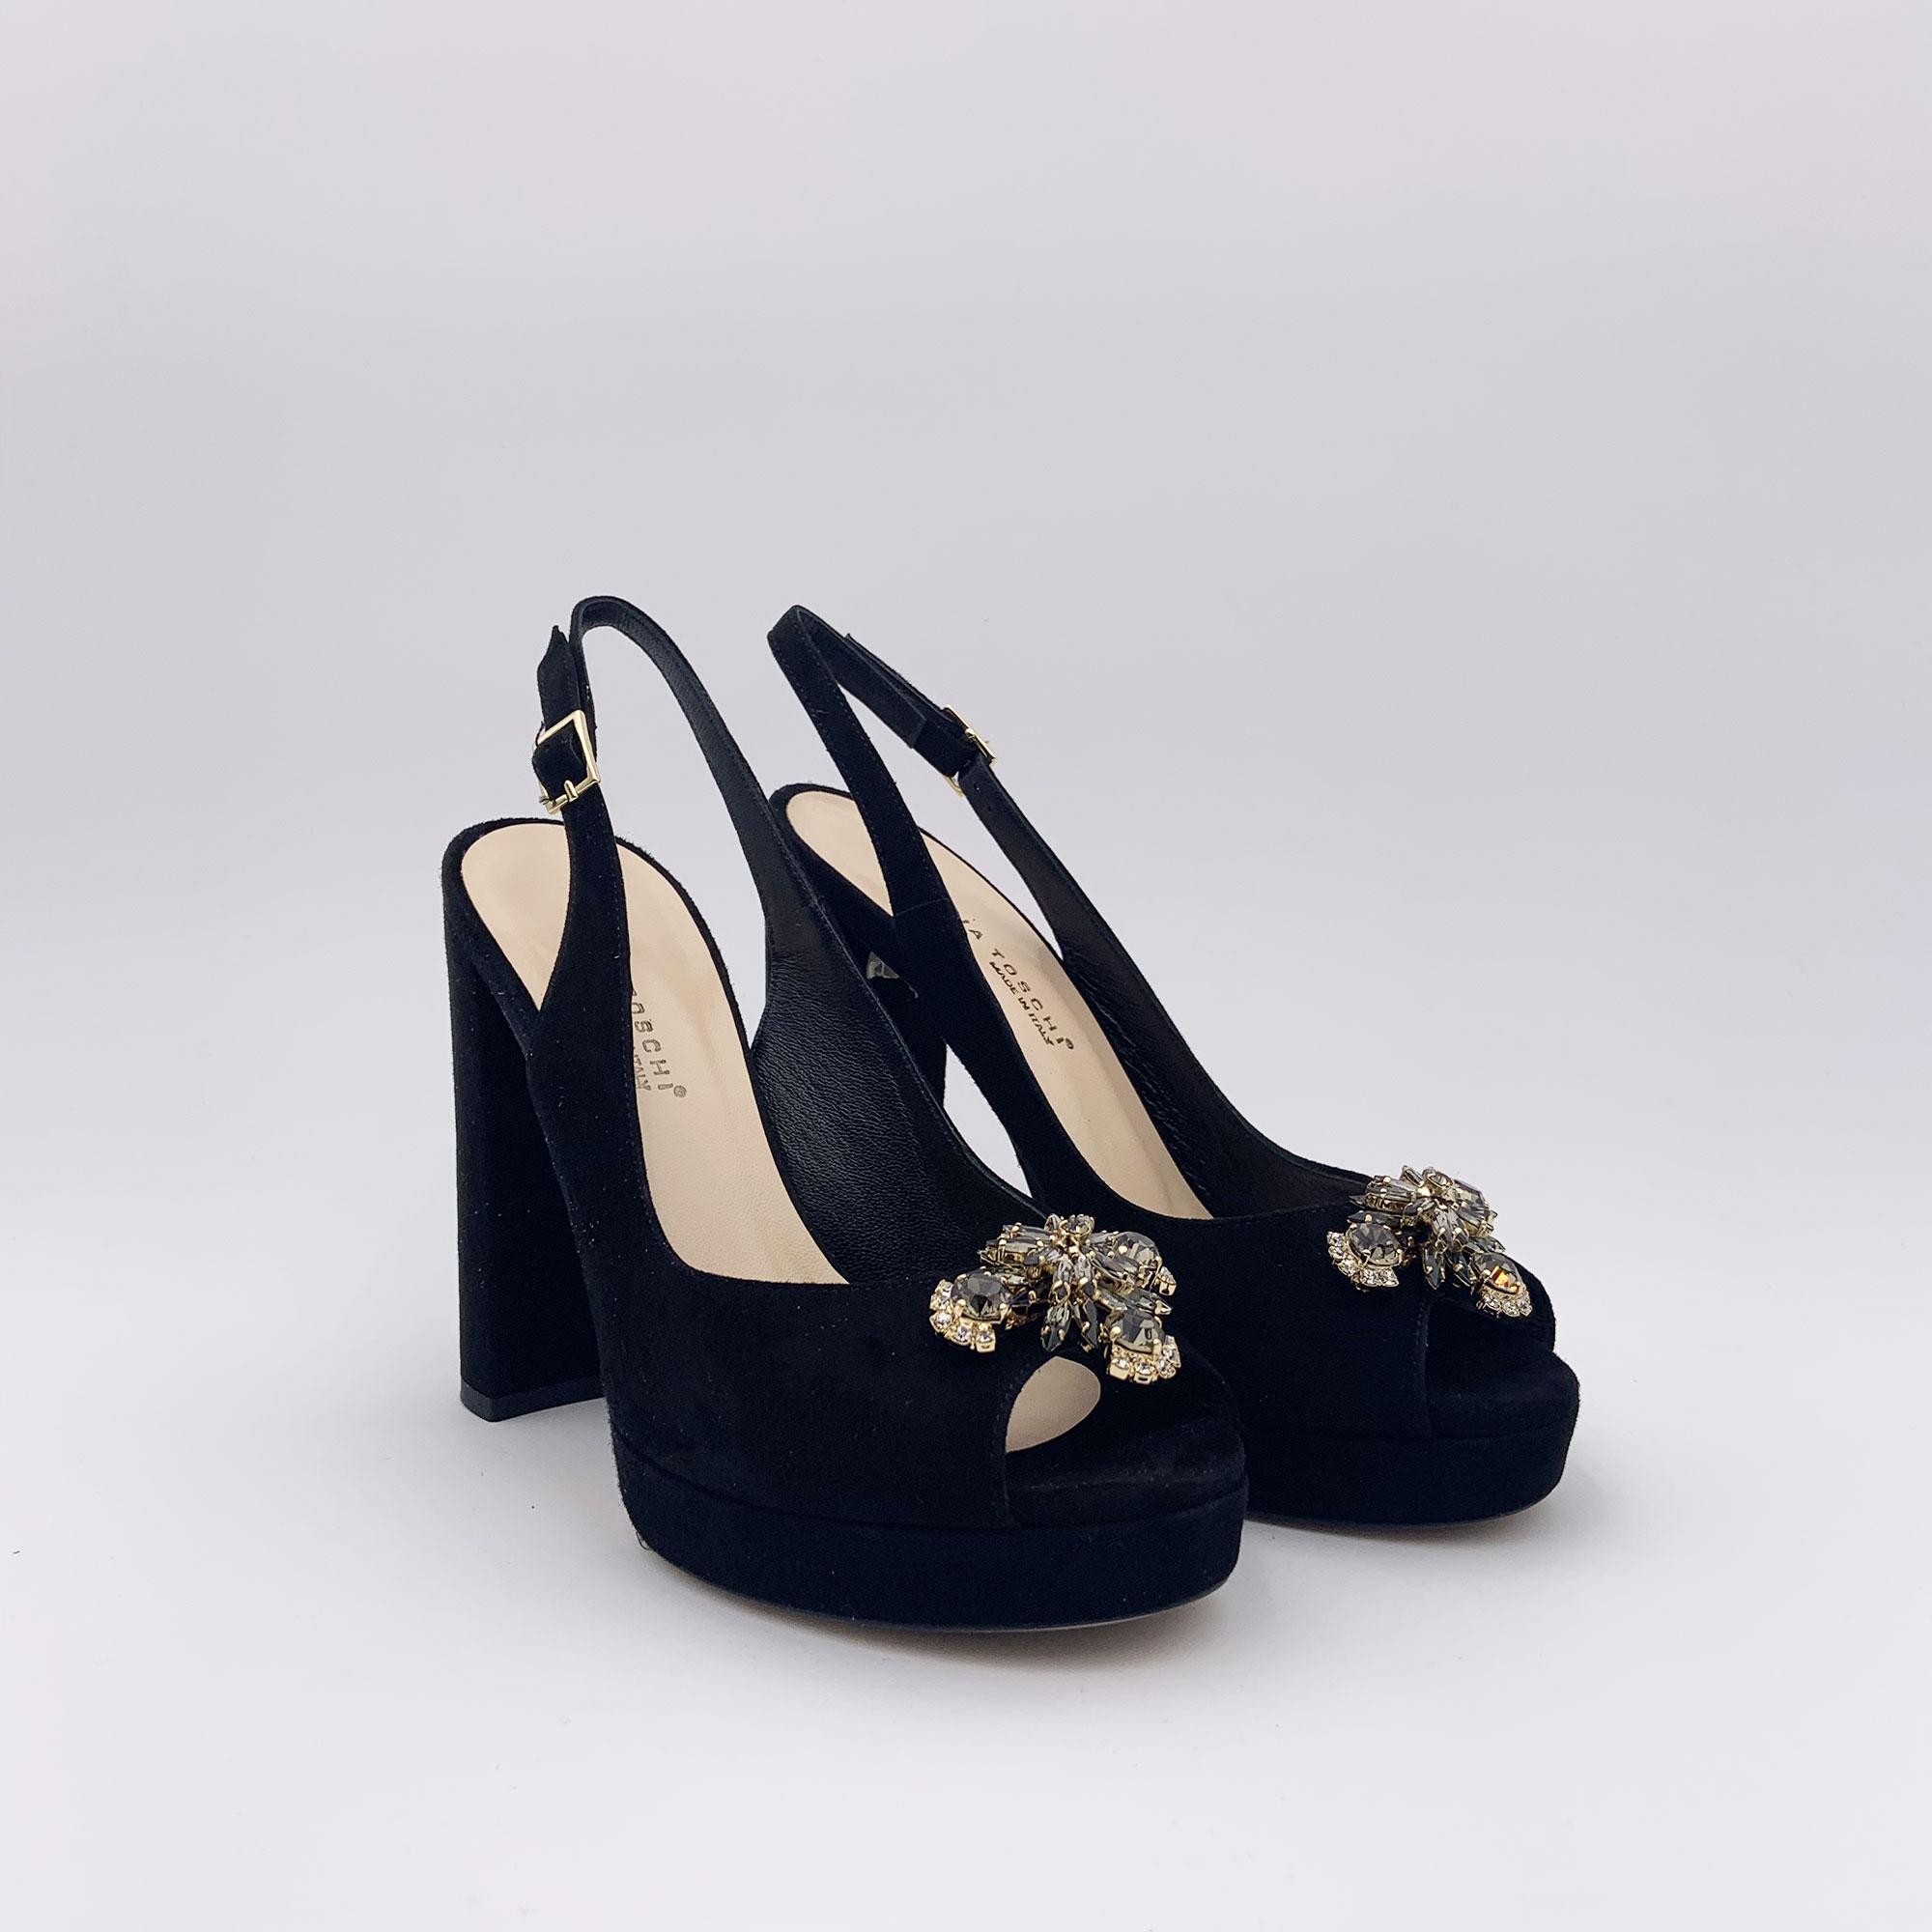 Sandalo chanel - Nero